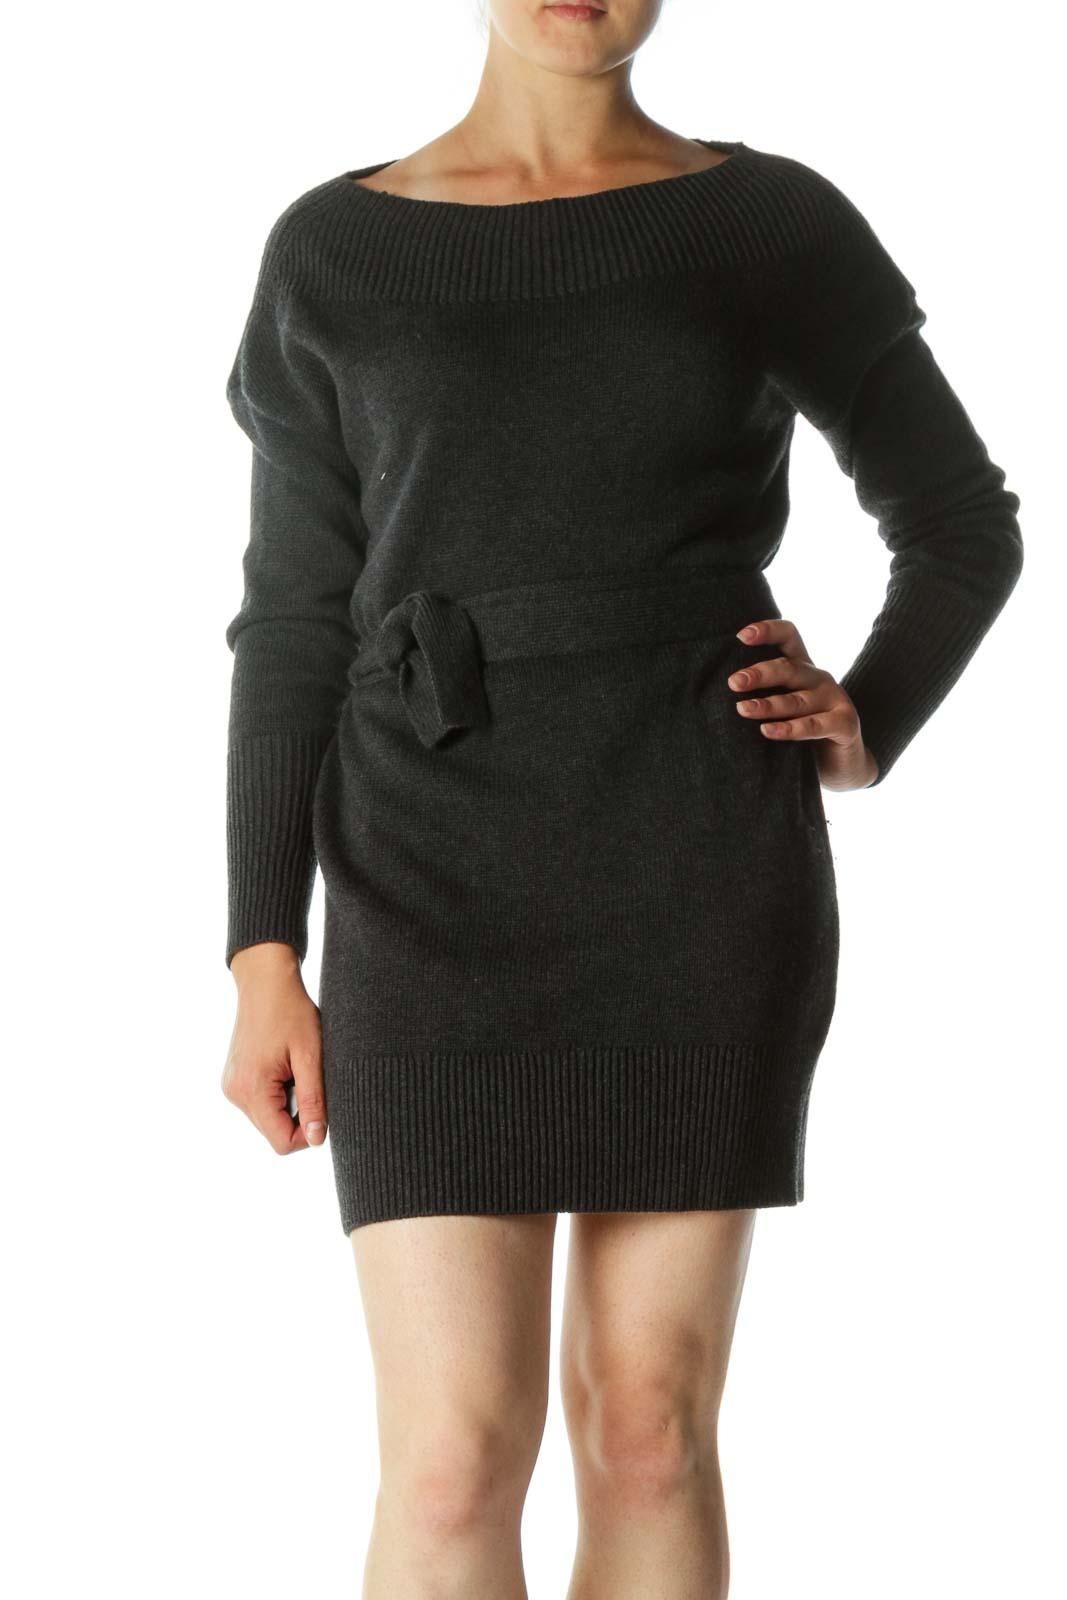 Gray Wool Blend Tie Waist Off-Shoulder Fit Dress Front